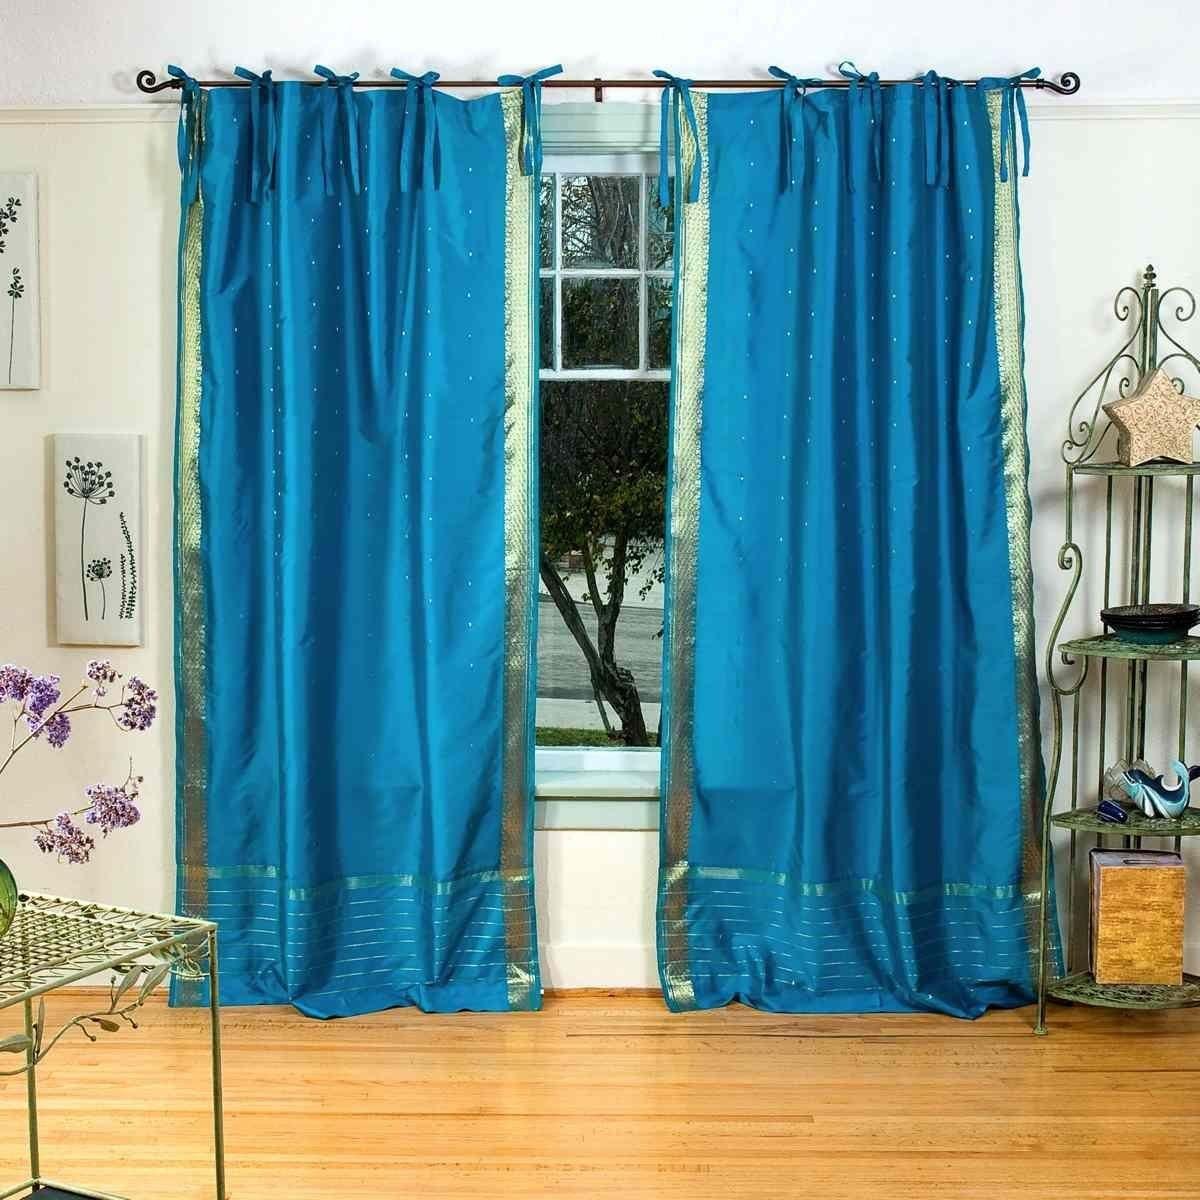 Turquoise Tie Top Sheer Sari Curtain / Drape / Panel - 43W x 84L - Piece: Amazon.co.uk: Kitchen & Home